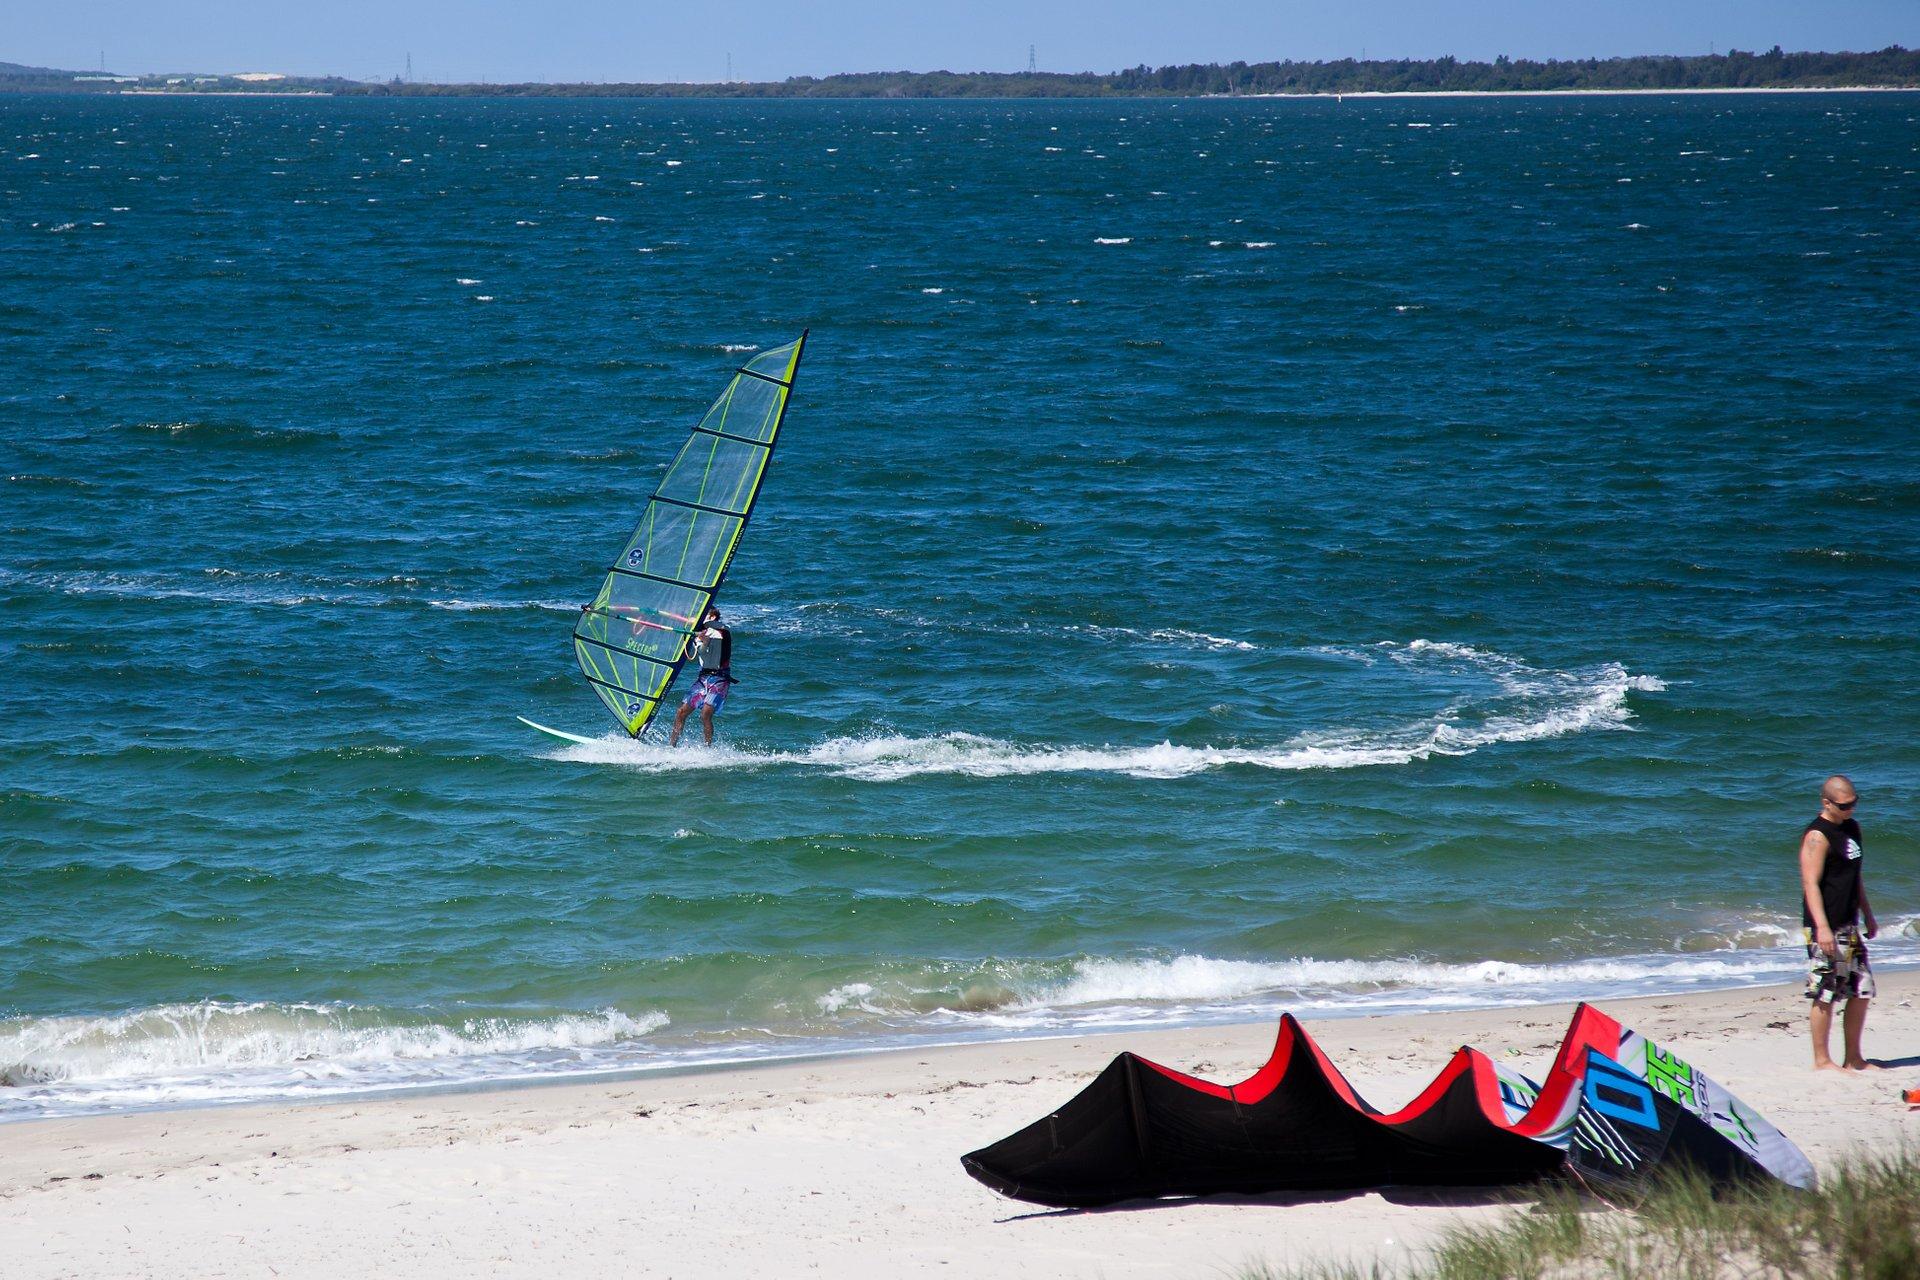 Windsurfer on Botany Bay 2020